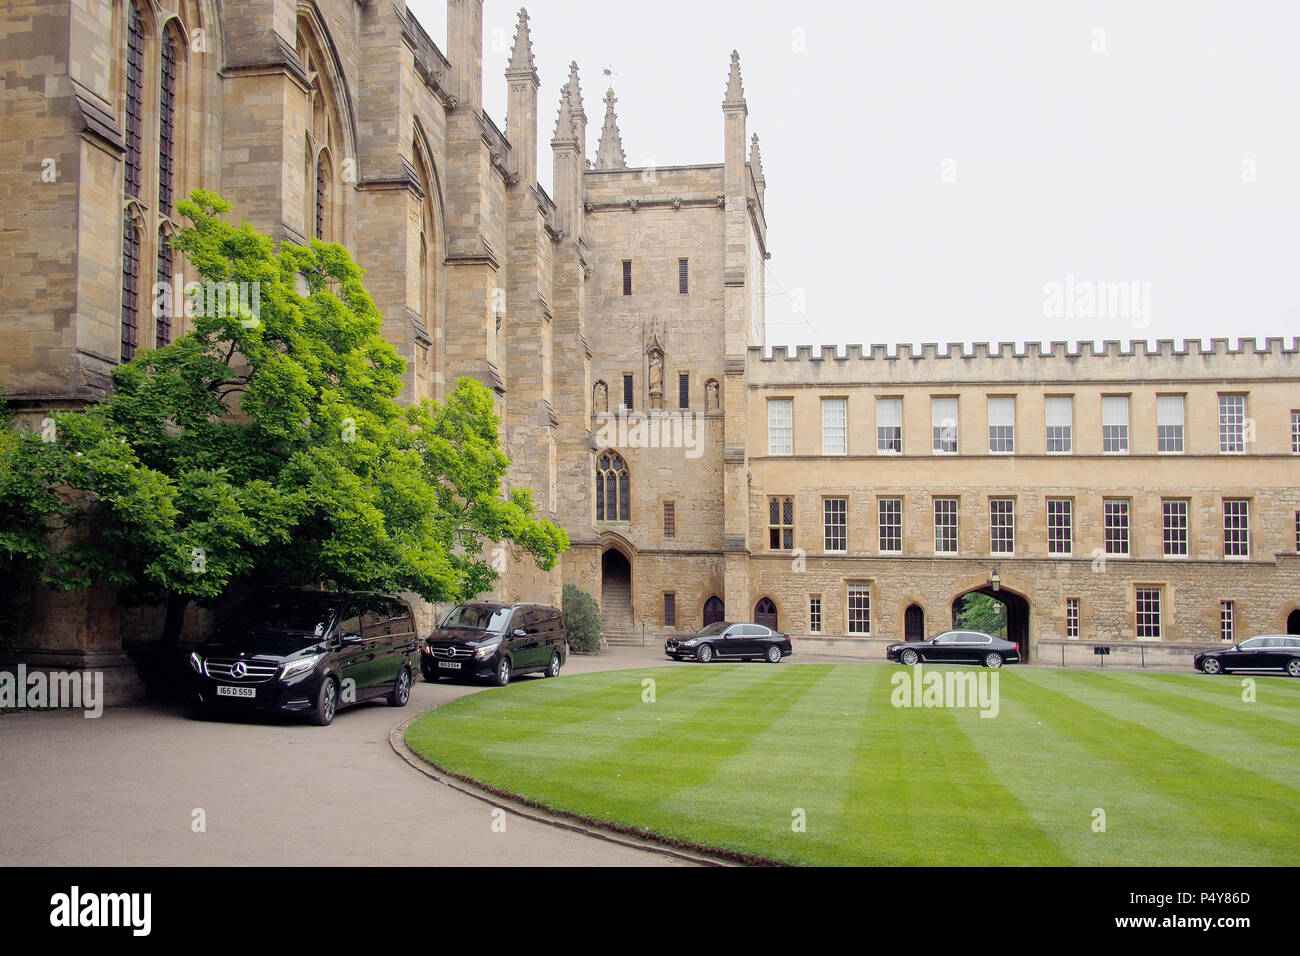 Oxford university in Oxfordshire England UK Stock Photo